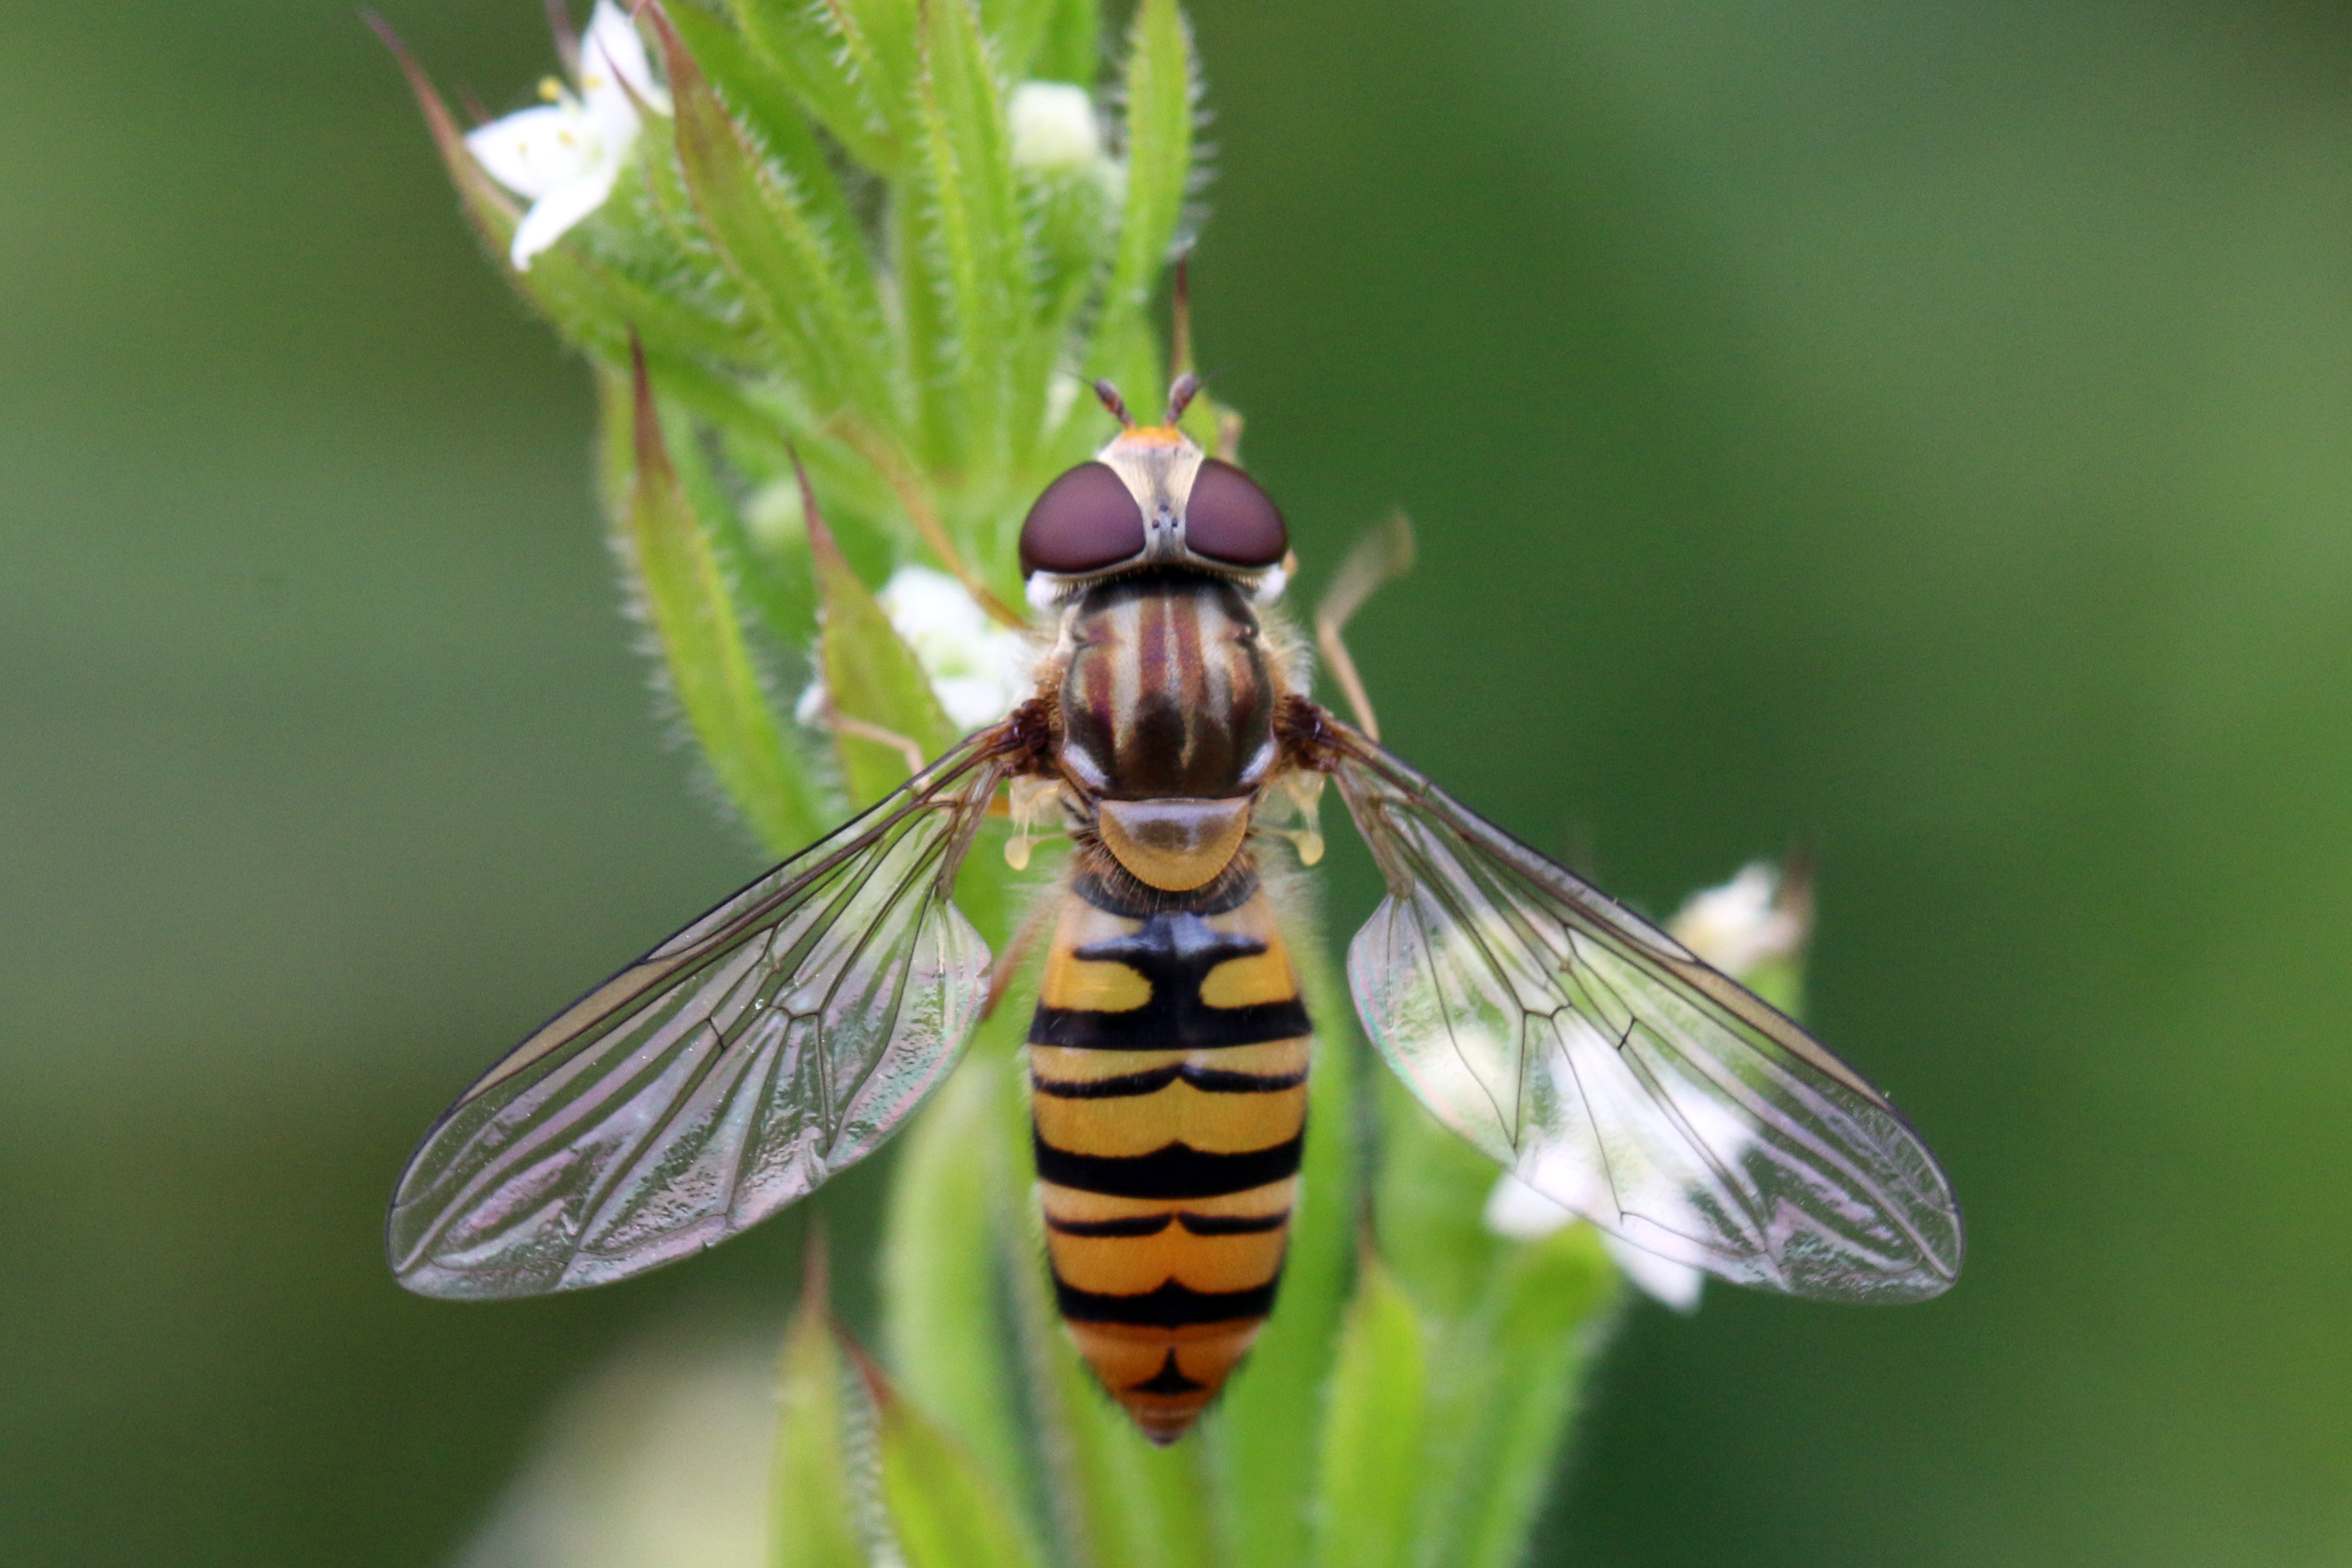 File:Marmalade hoverfly (Episyrphus balteatus) female.jpg.